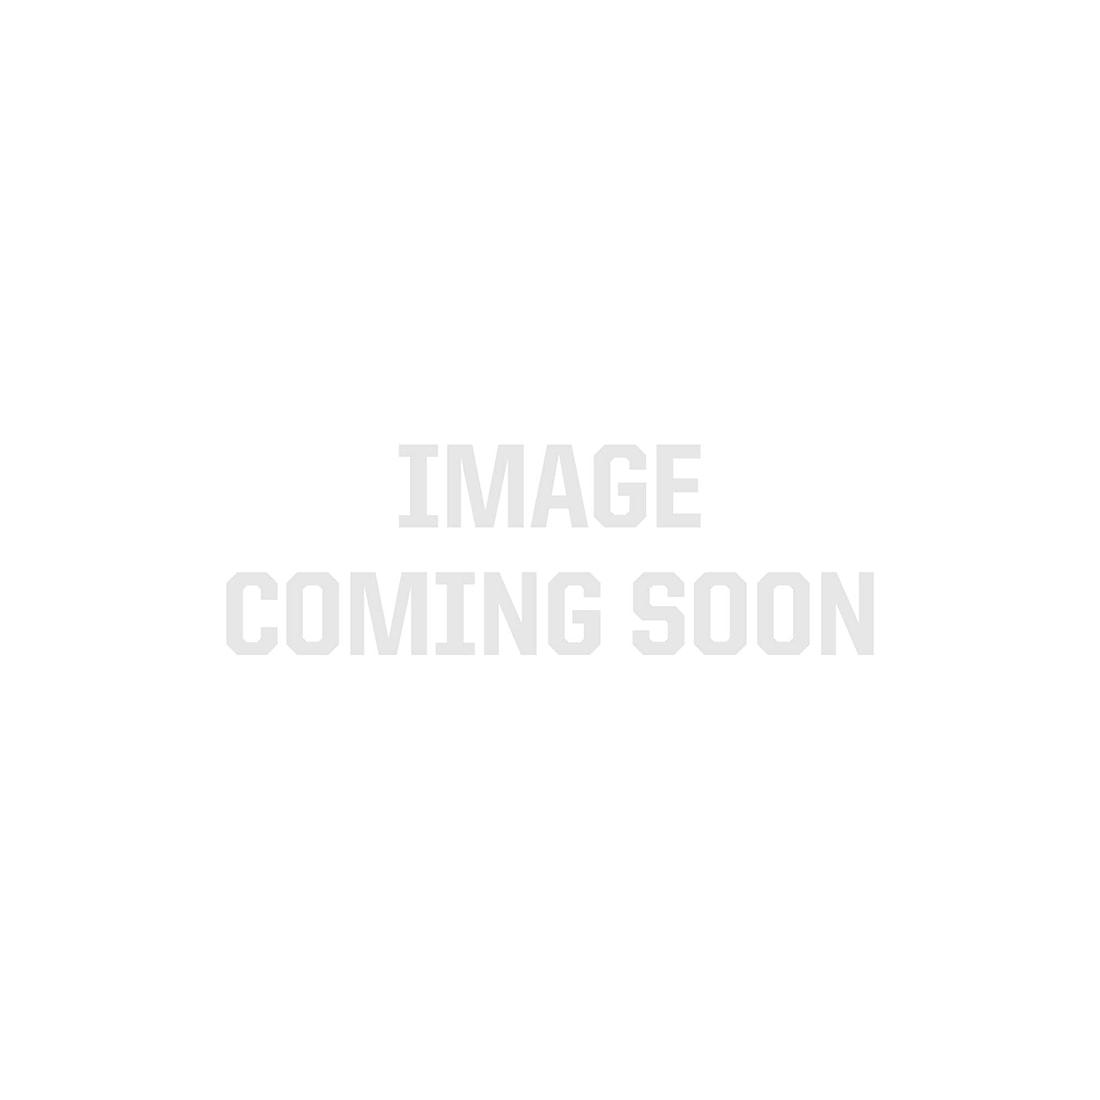 Amber 3014 Side View LED Strip Light, 96/m, 8mm wide, Sample Kit